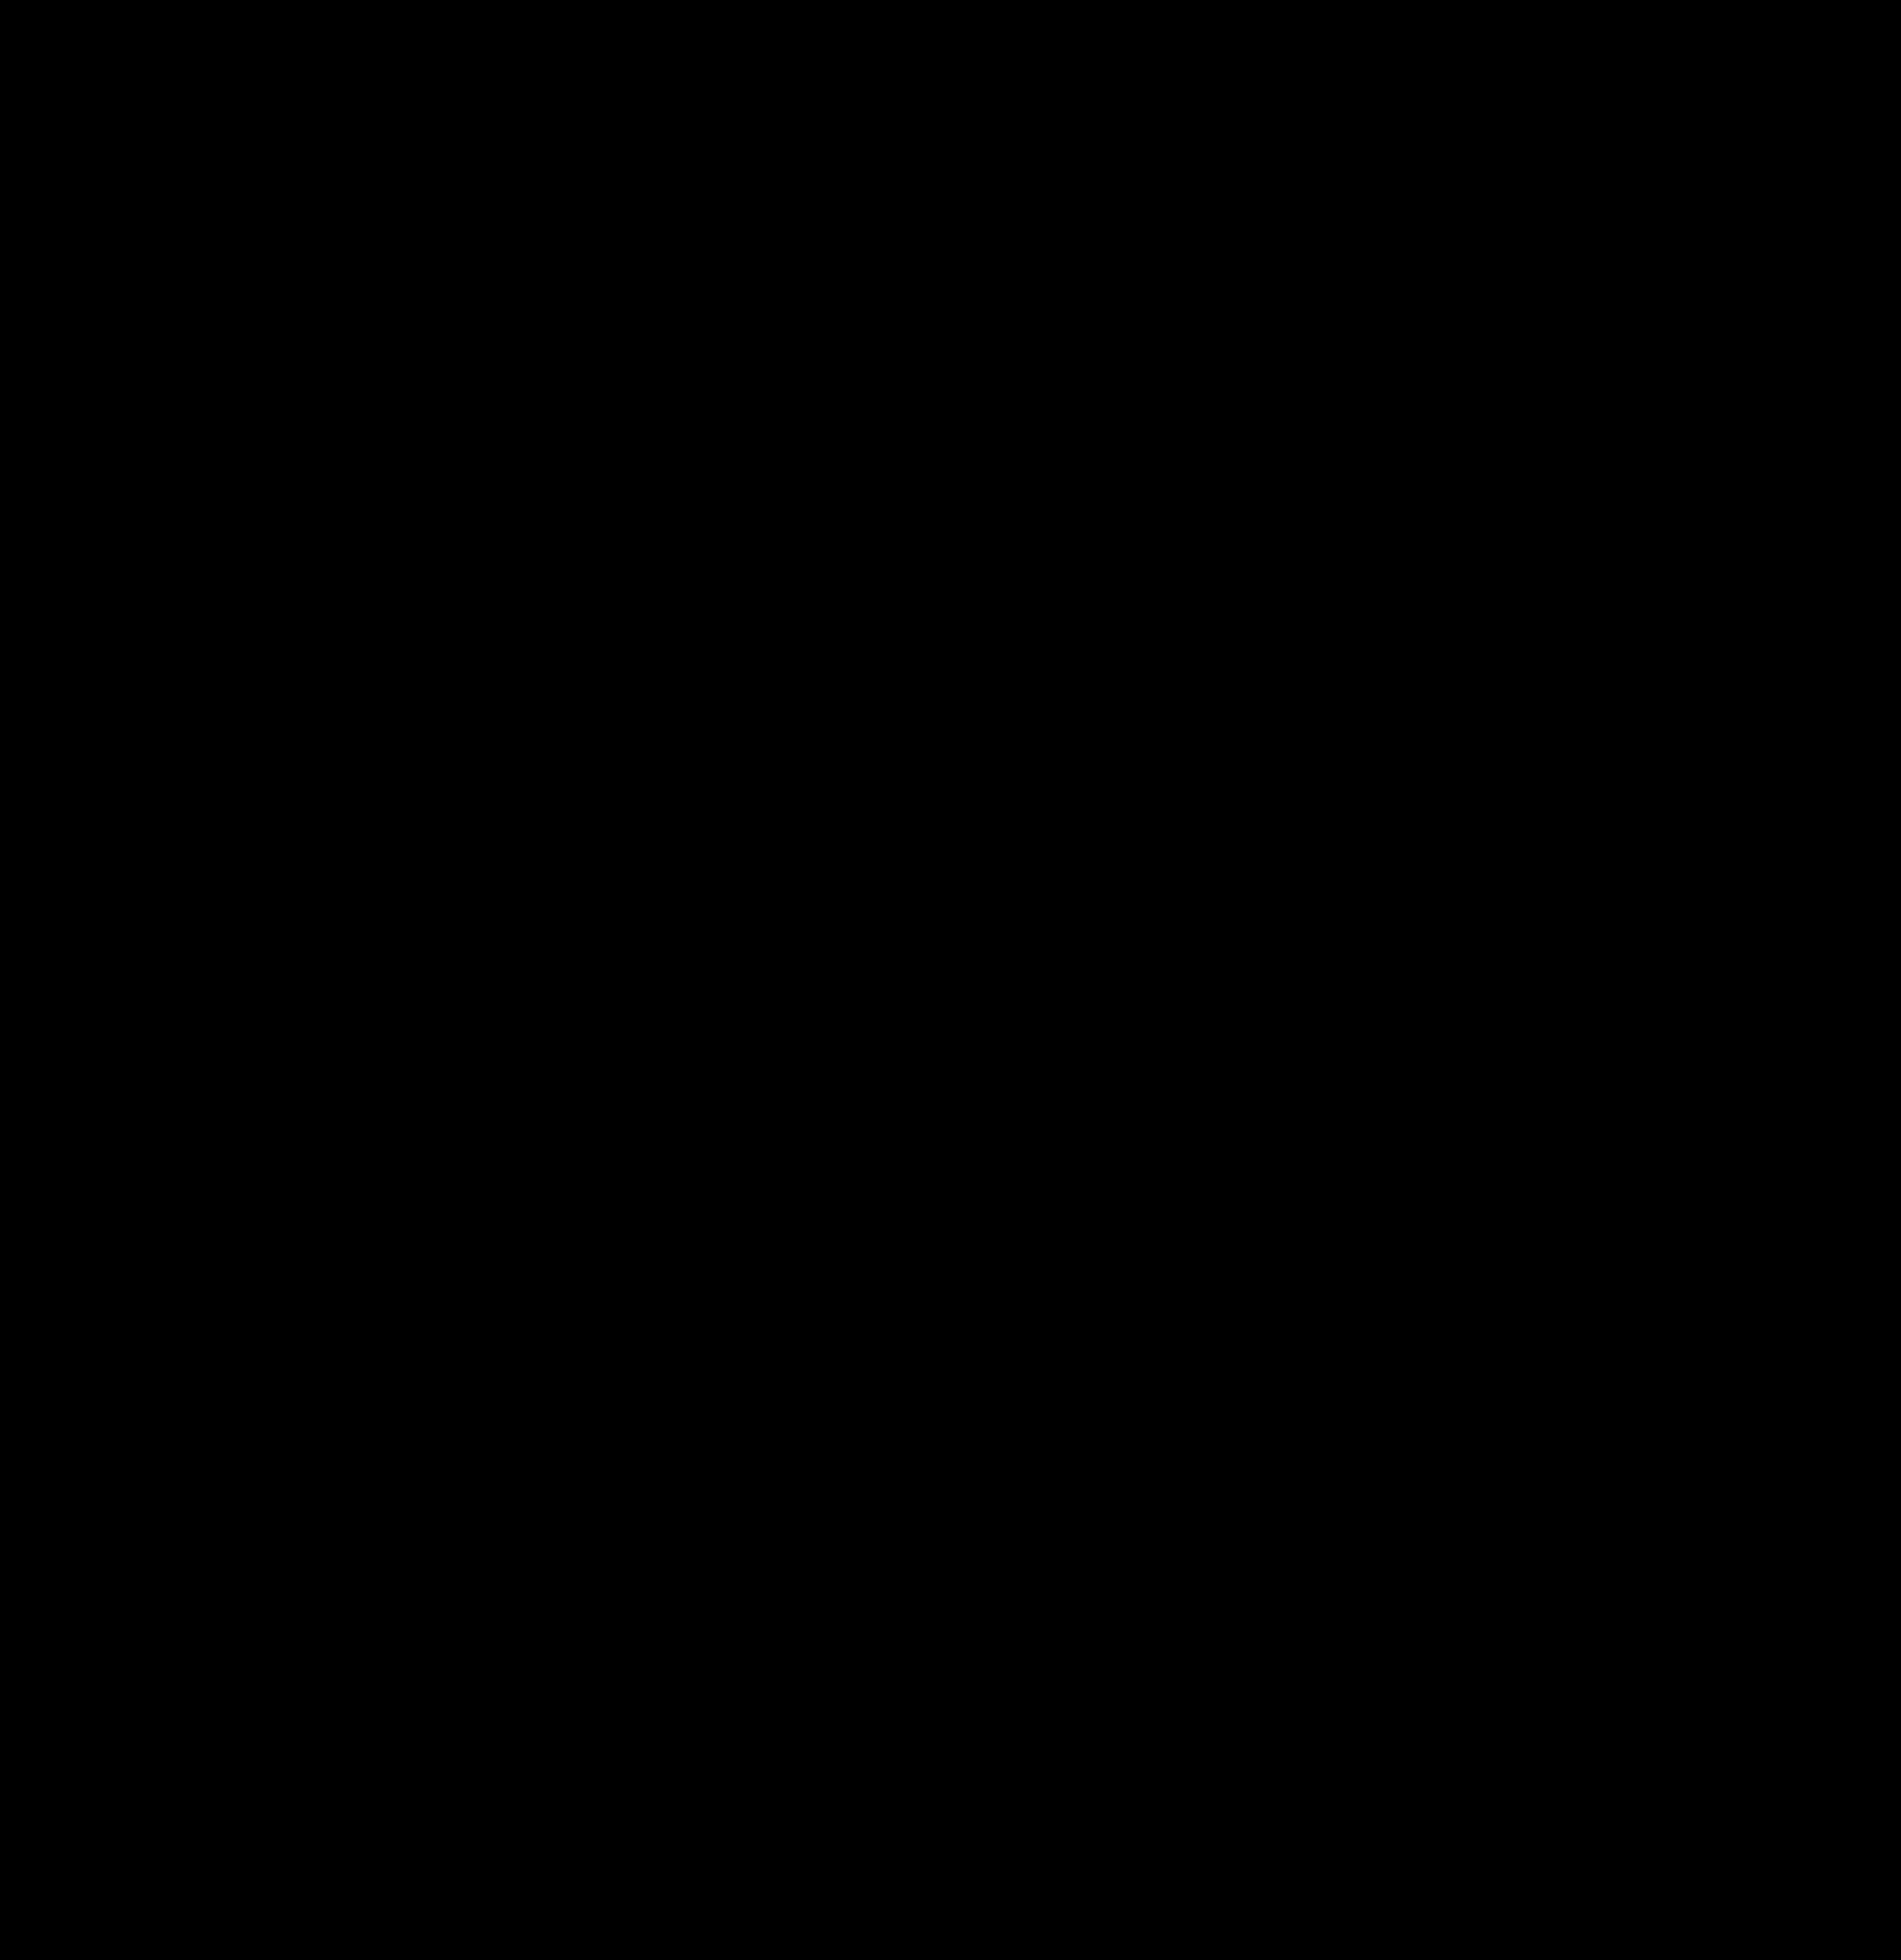 2000px-Aum_Om_black.svg.png